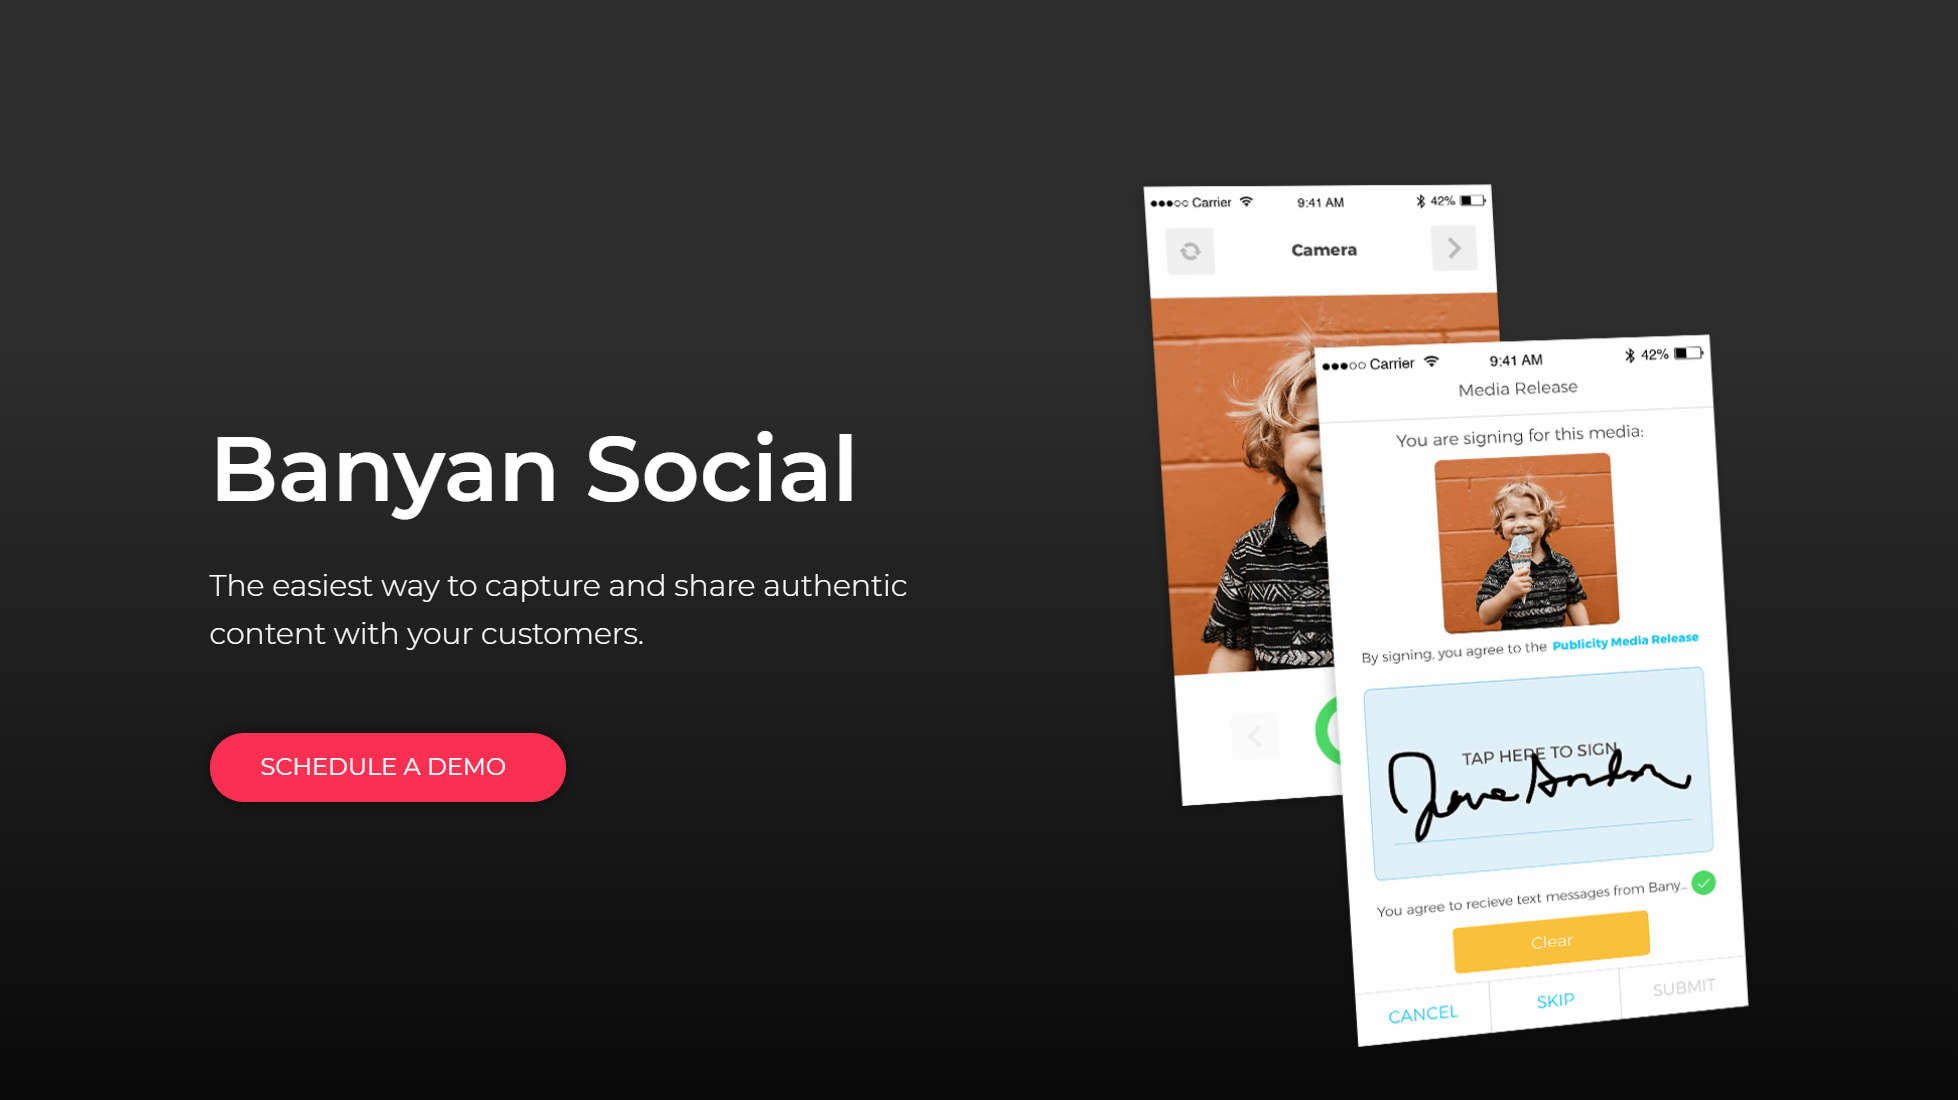 Nuvi Acquires Patient Experience Platform Banyan